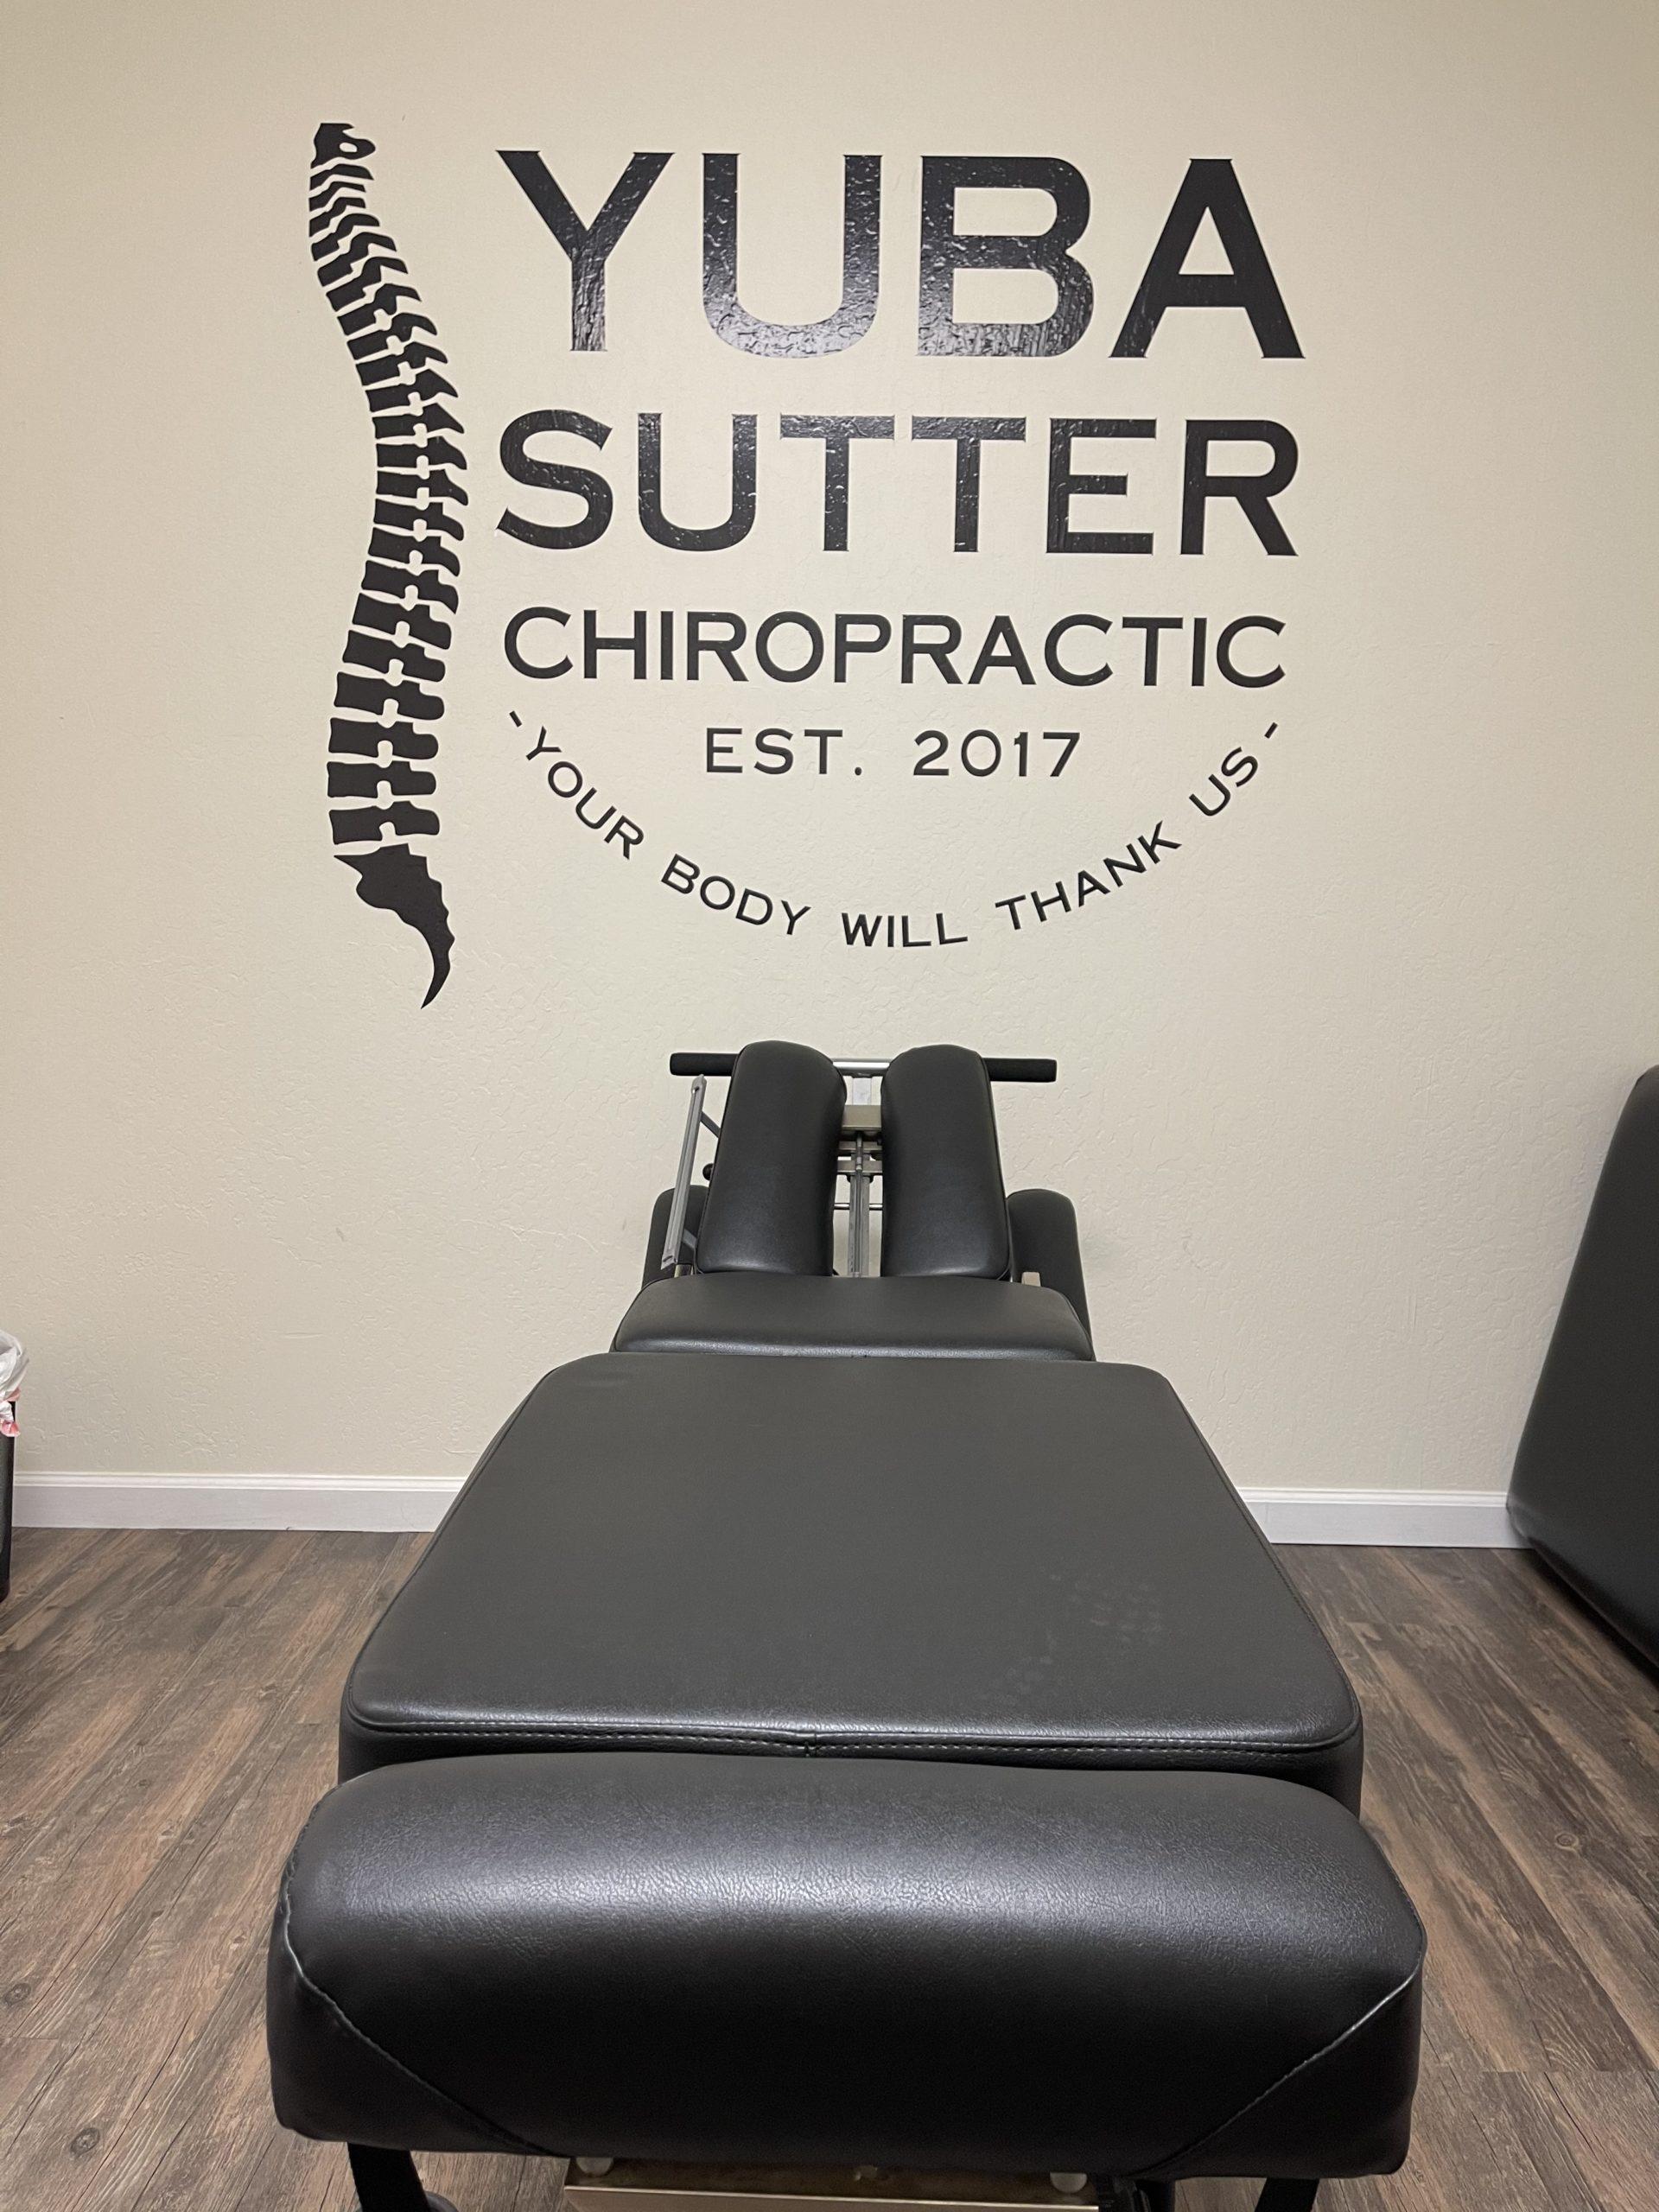 Yuba Sutter Chiropractic